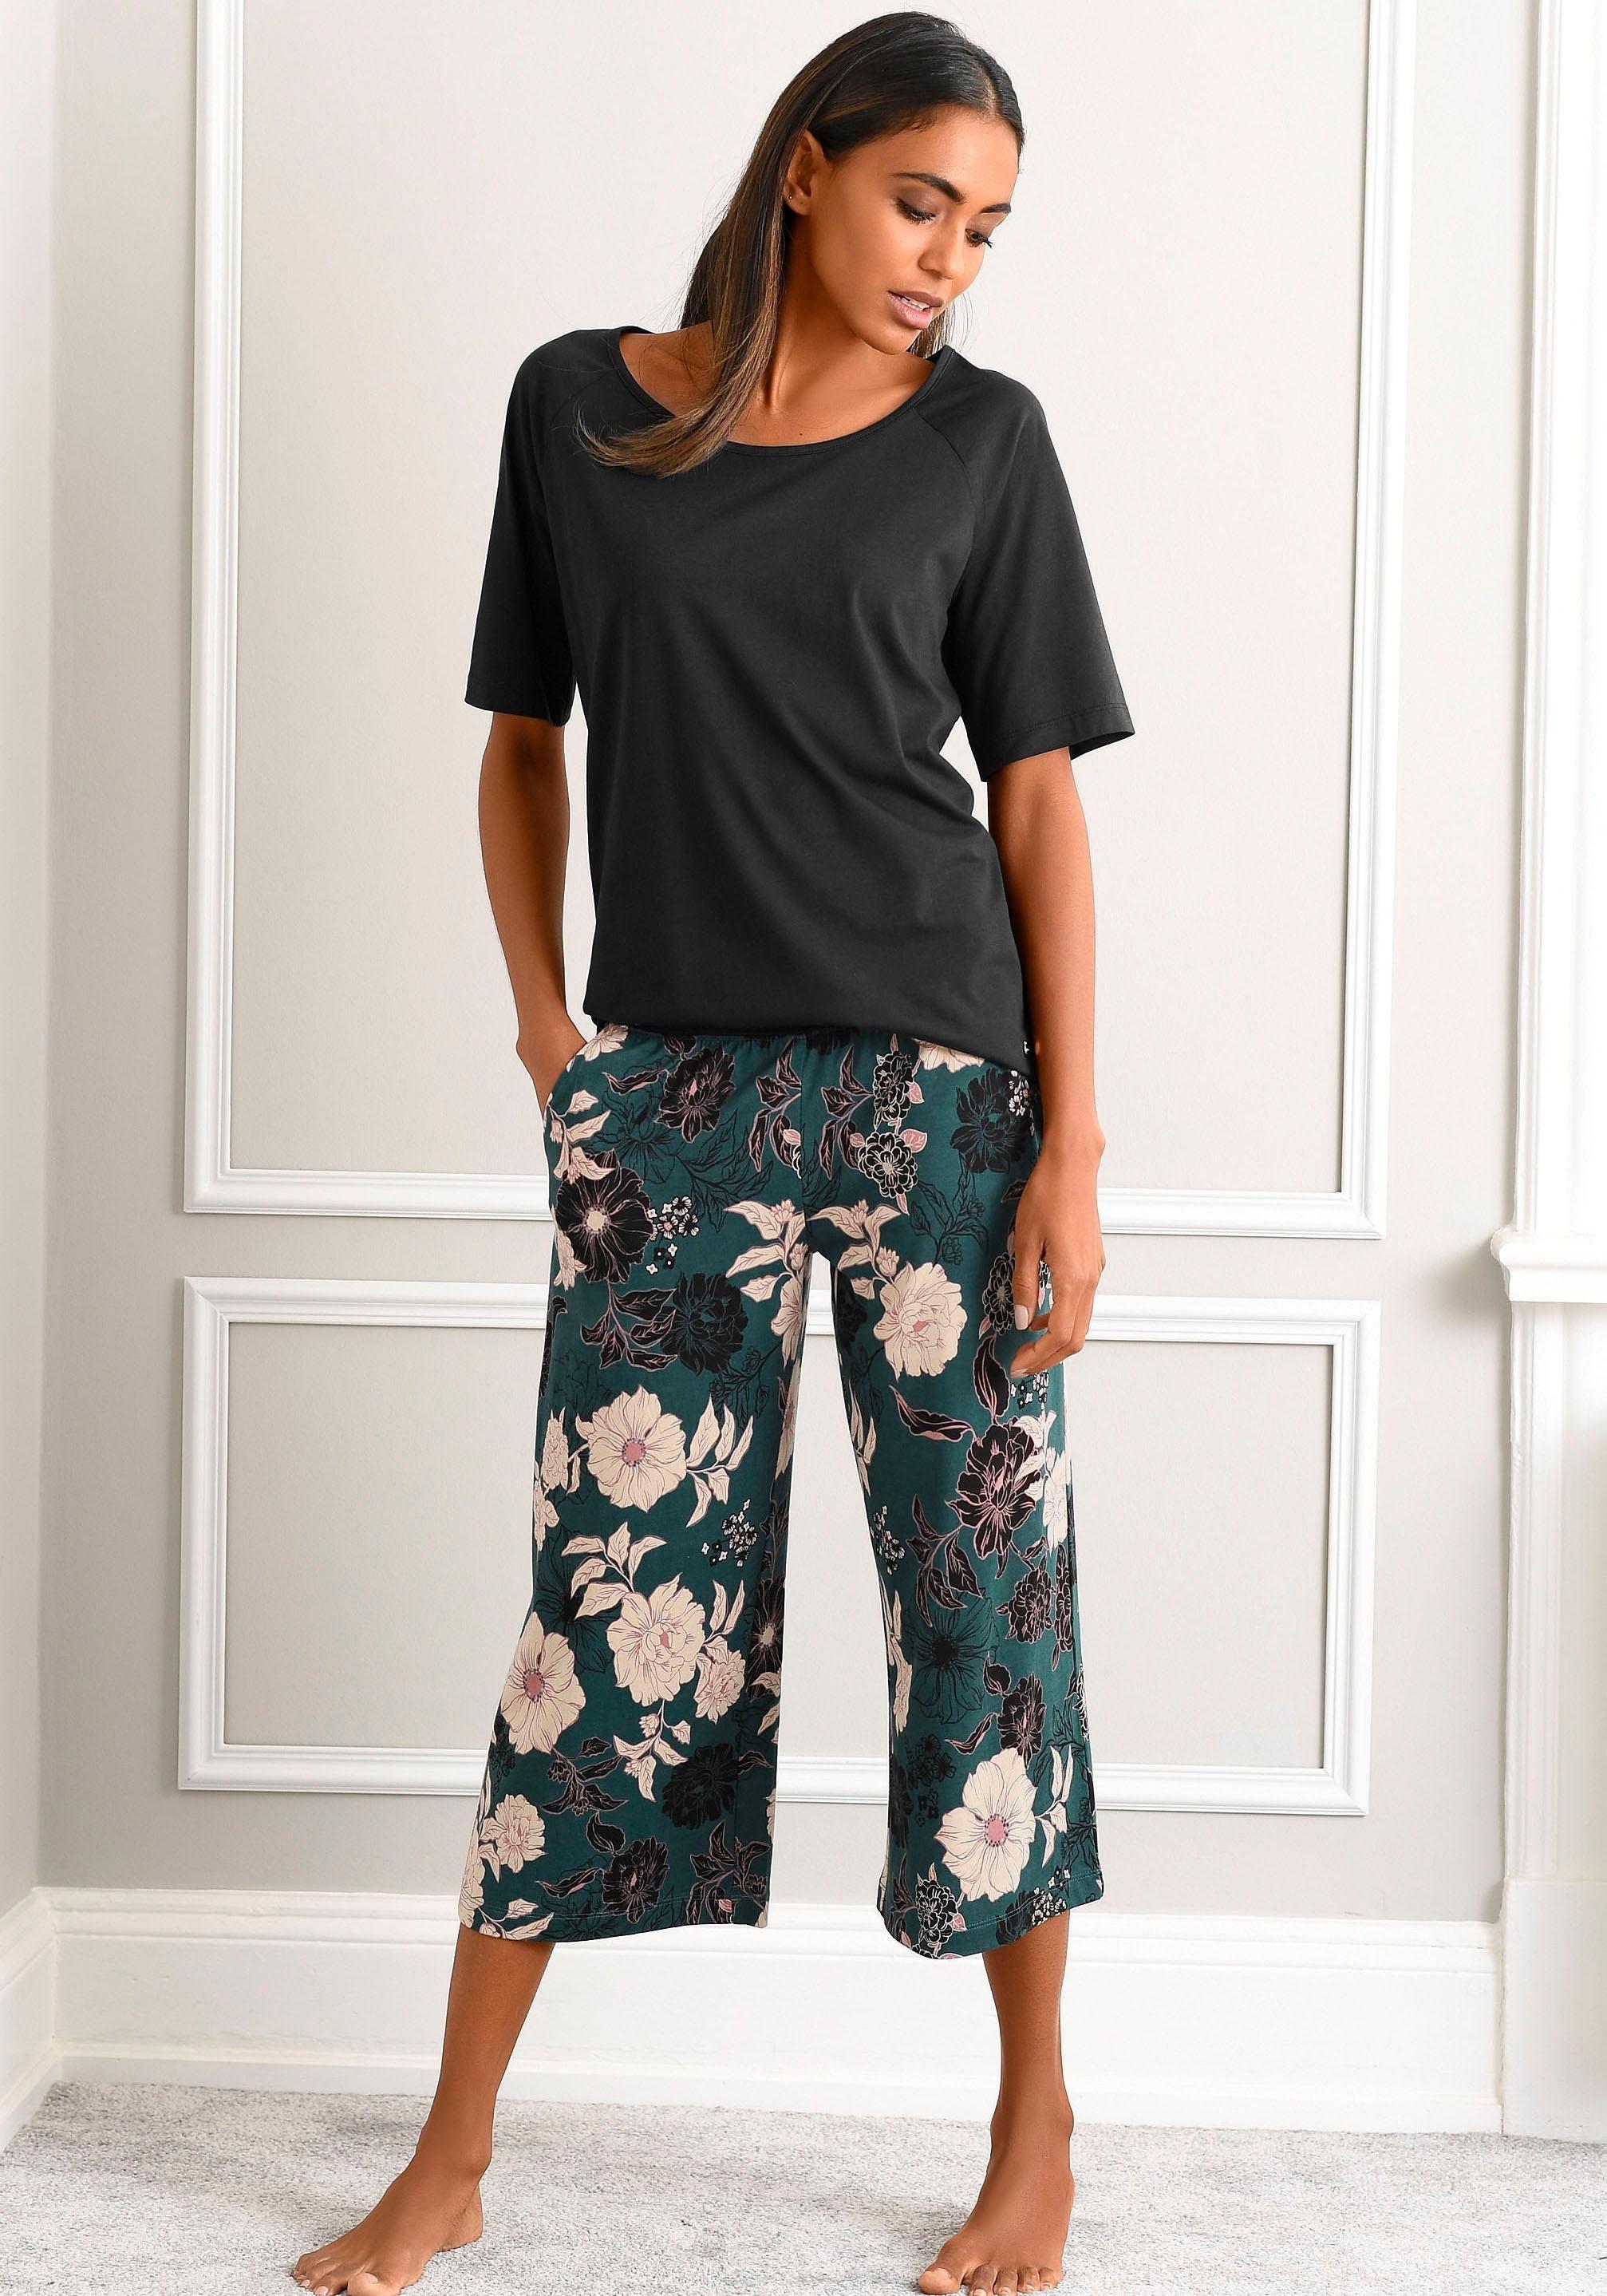 S.oliver Bodywear capripyjama nu online bestellen